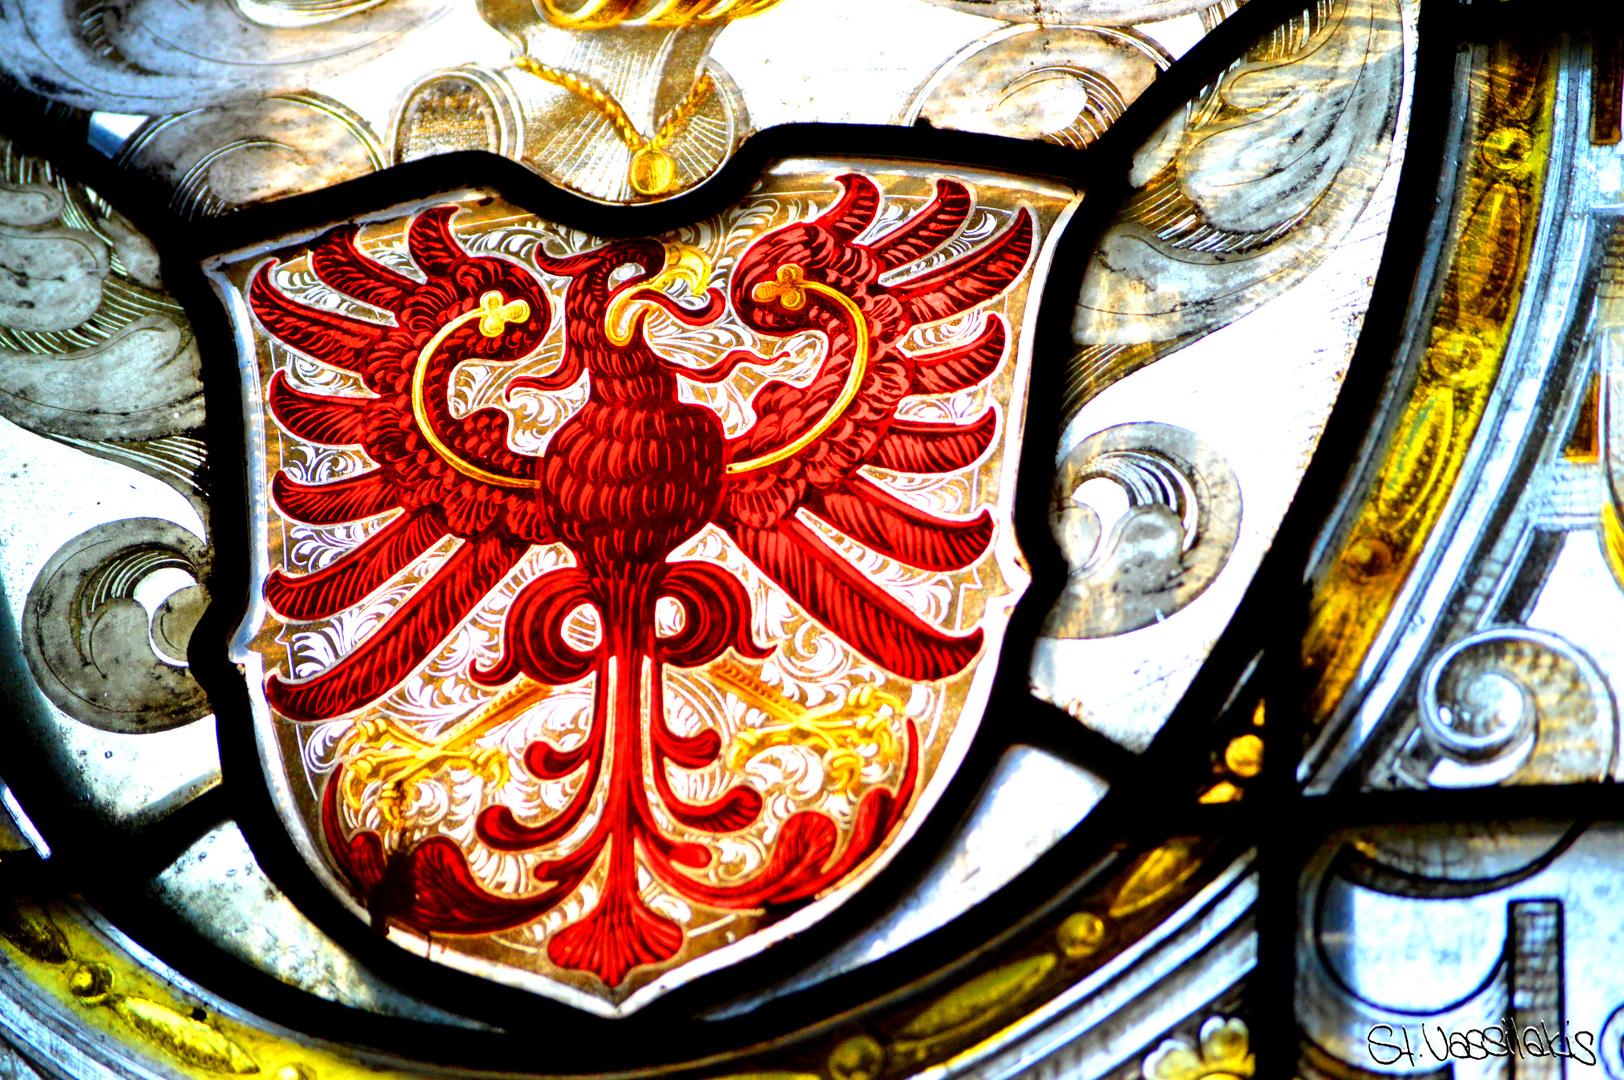 Wappen im Fenster